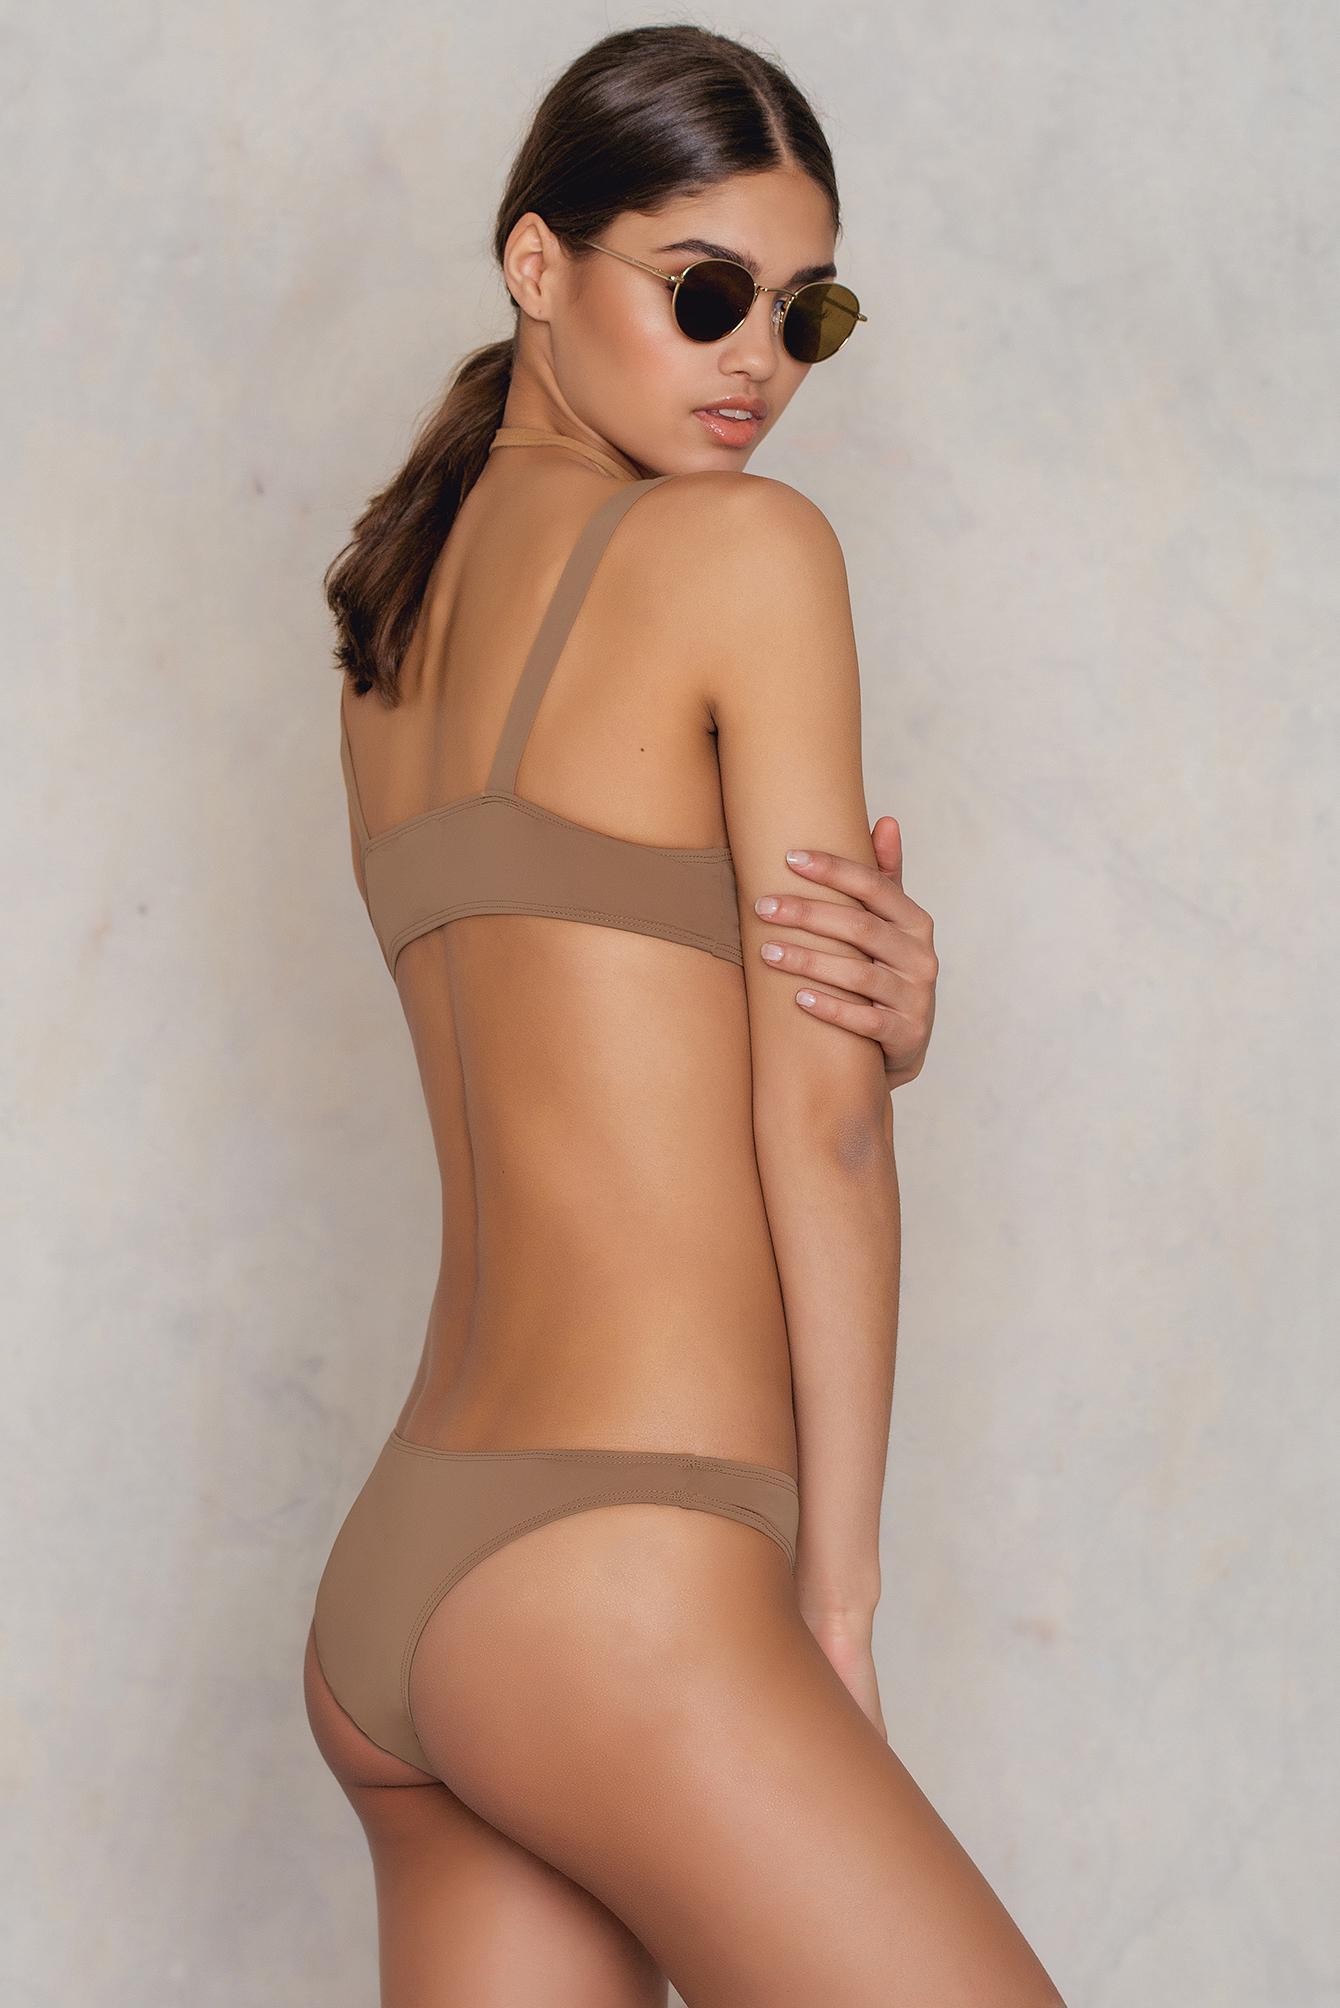 lyst - lioness anjelica houston bikini in brown